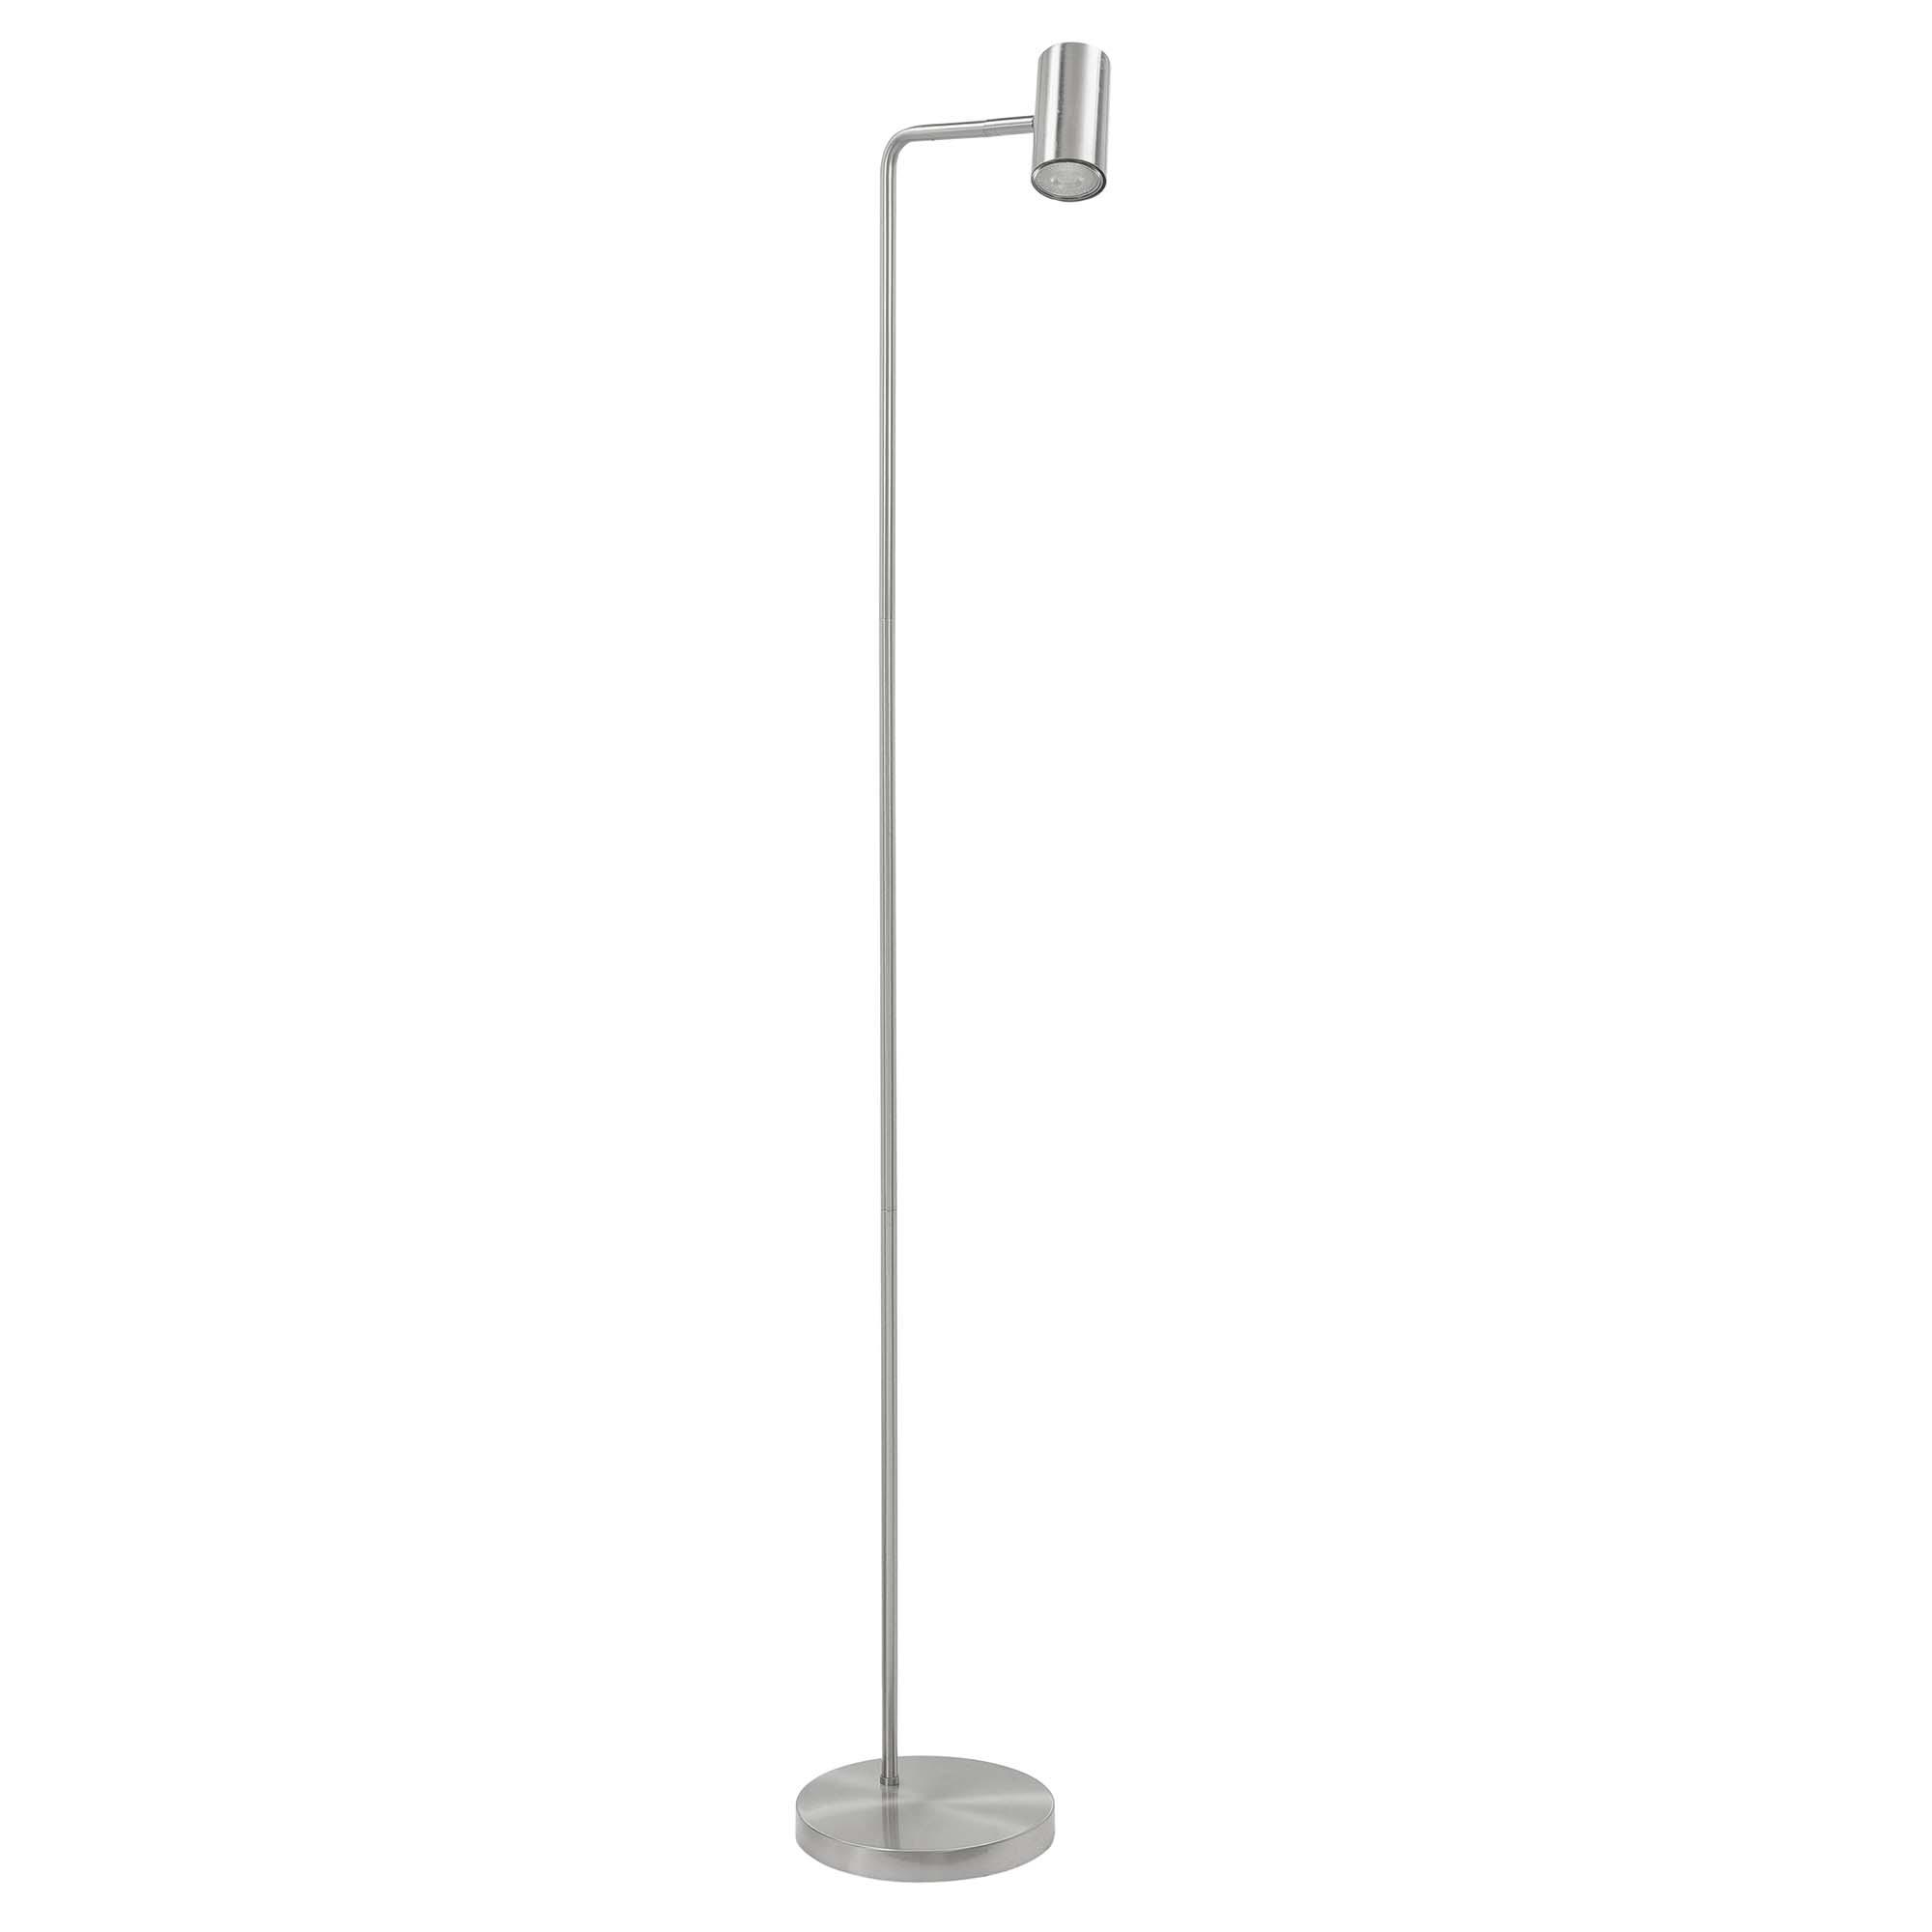 Highlight Vloerlamp Burgos 1 lichts H 134 cm mat chroom